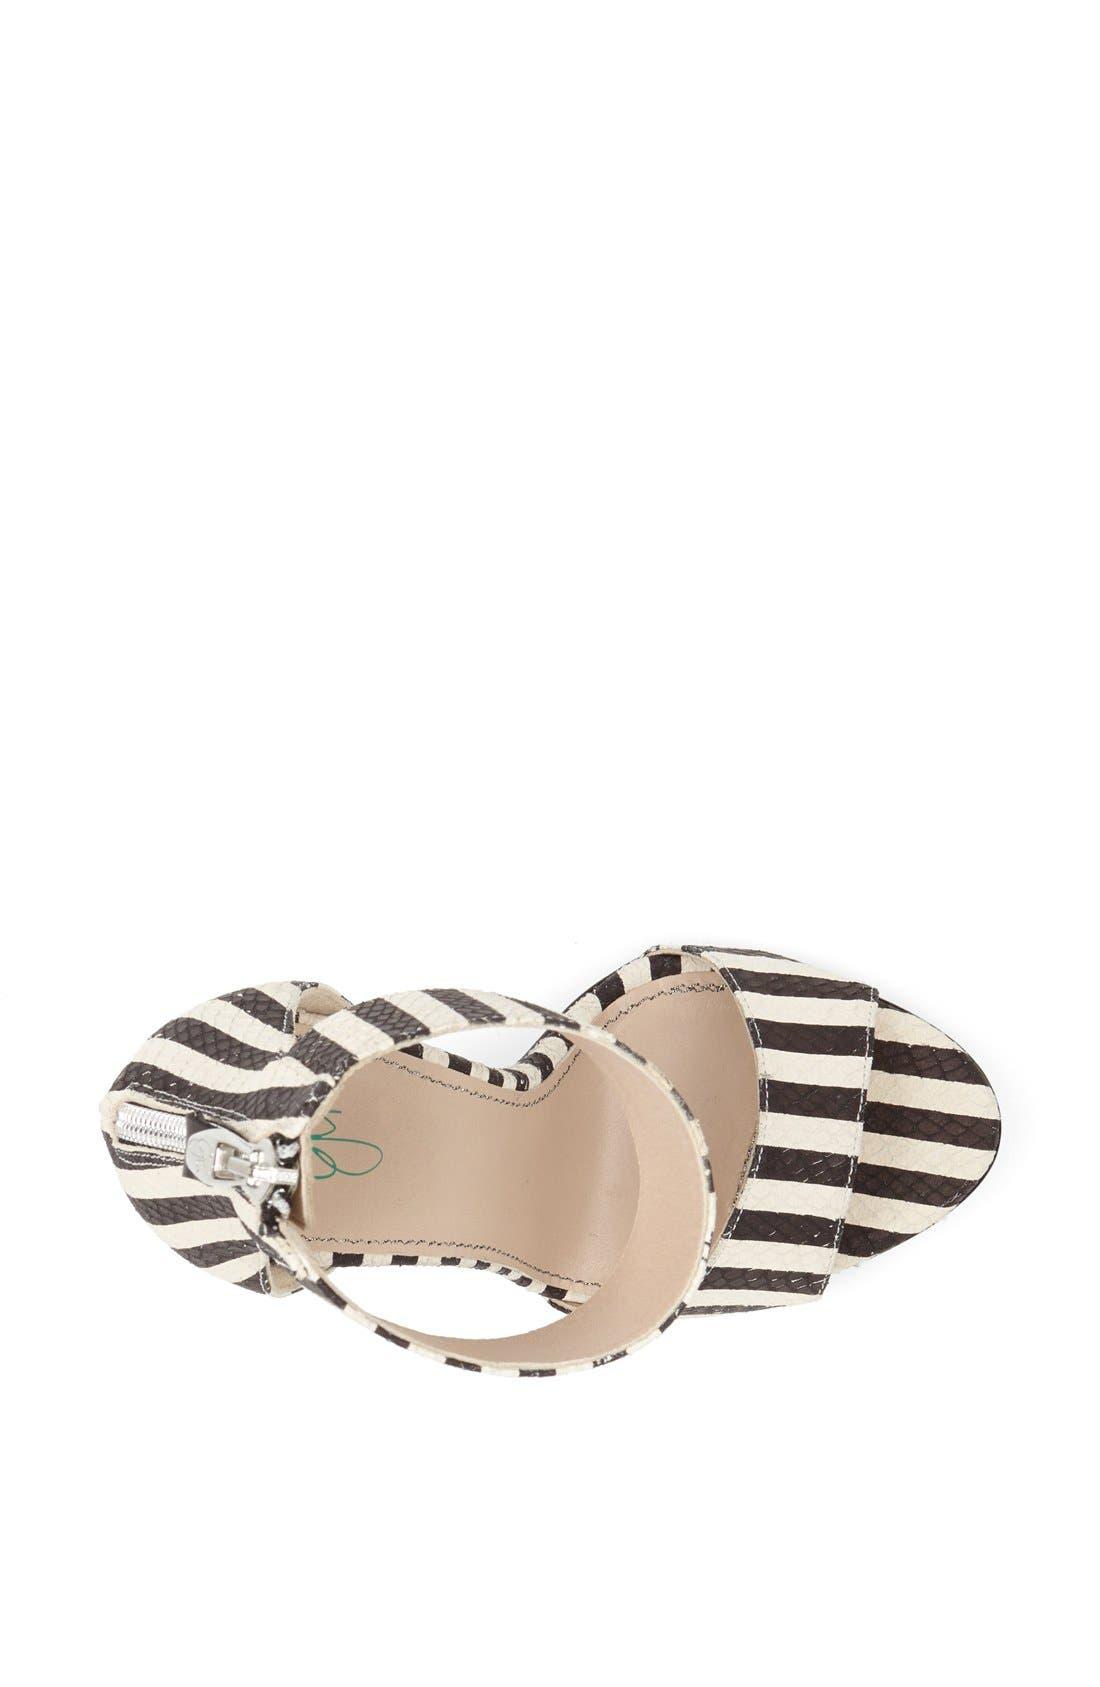 Alternate Image 3  - CJG 'Malibu' Sandal